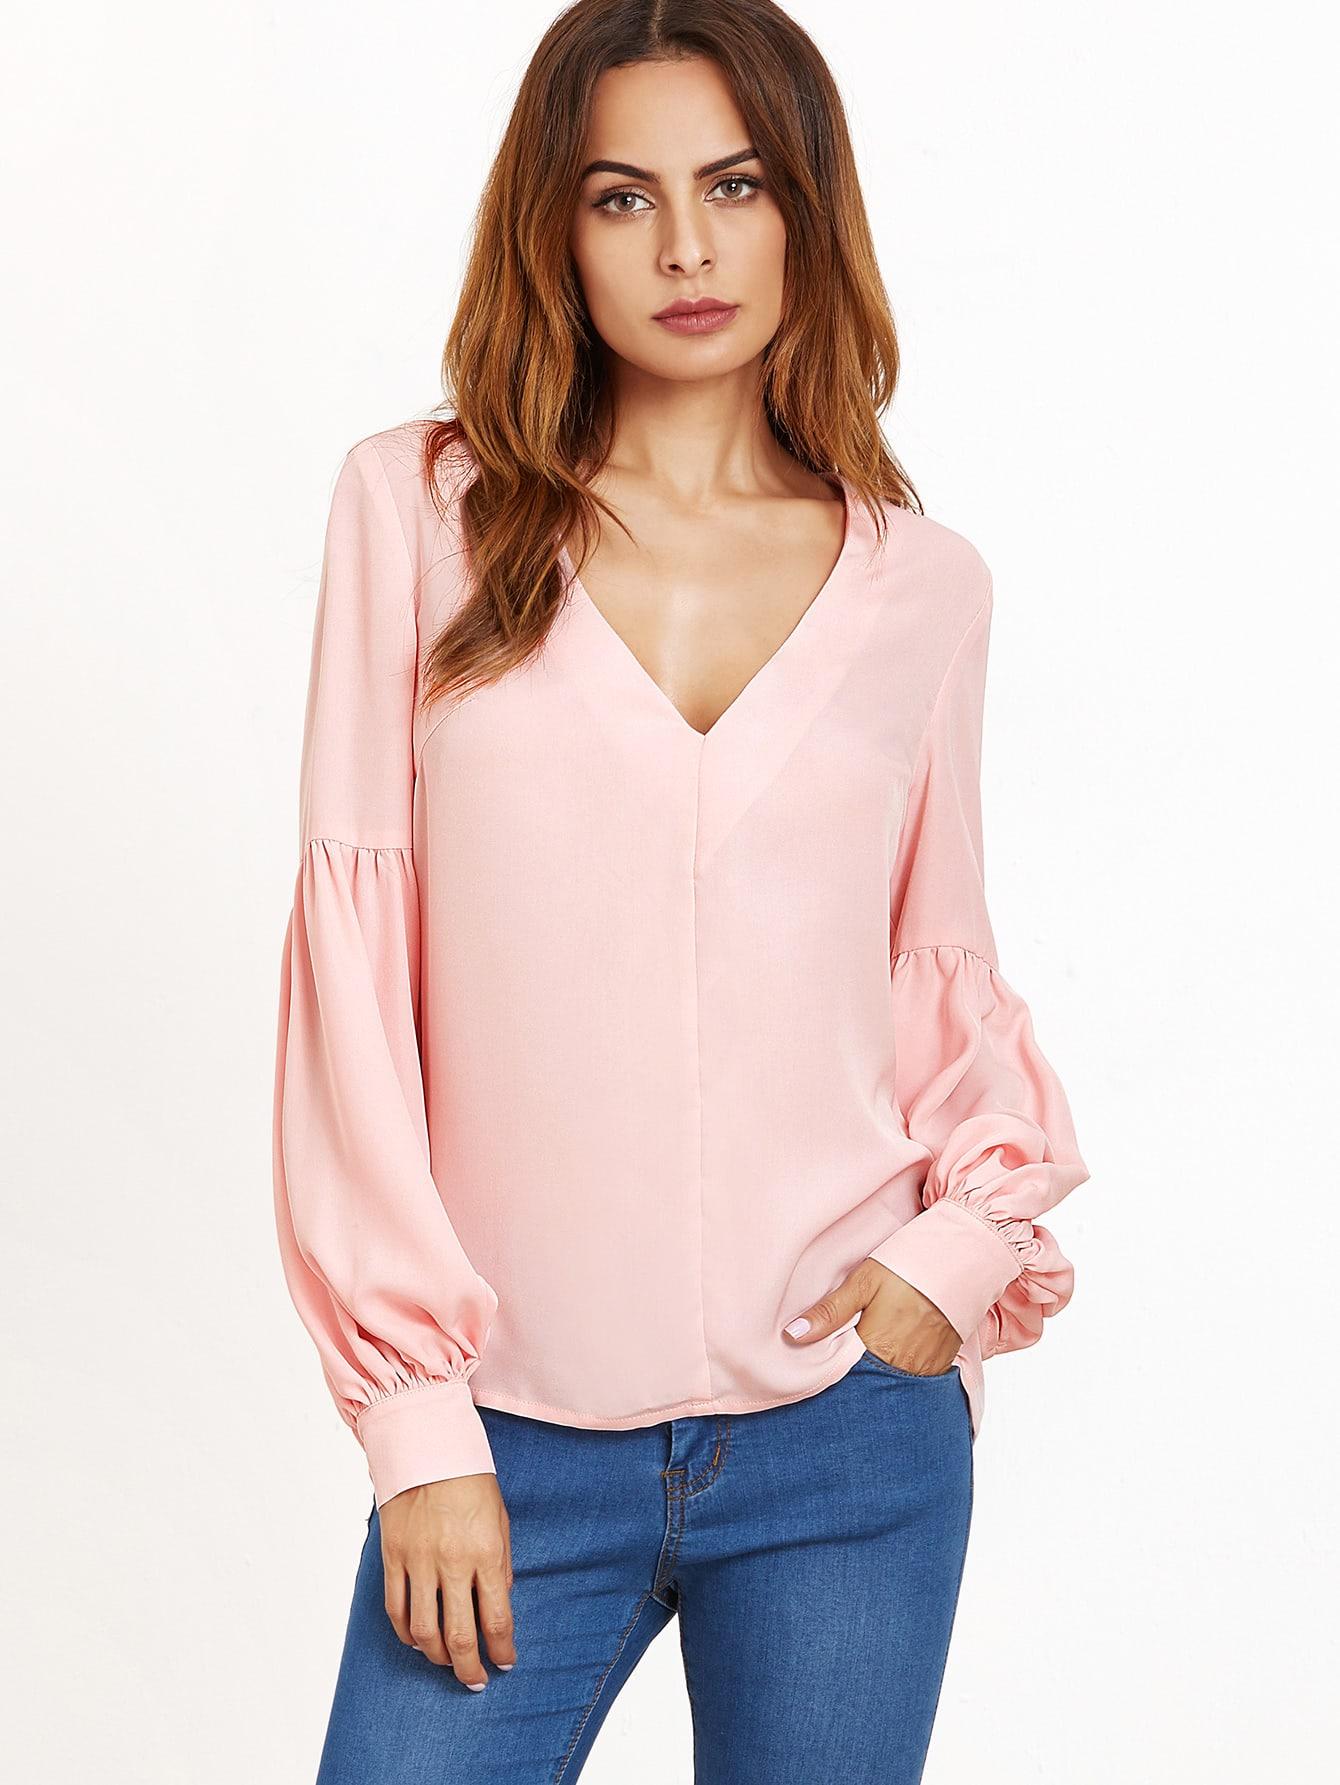 blouse161024702_2